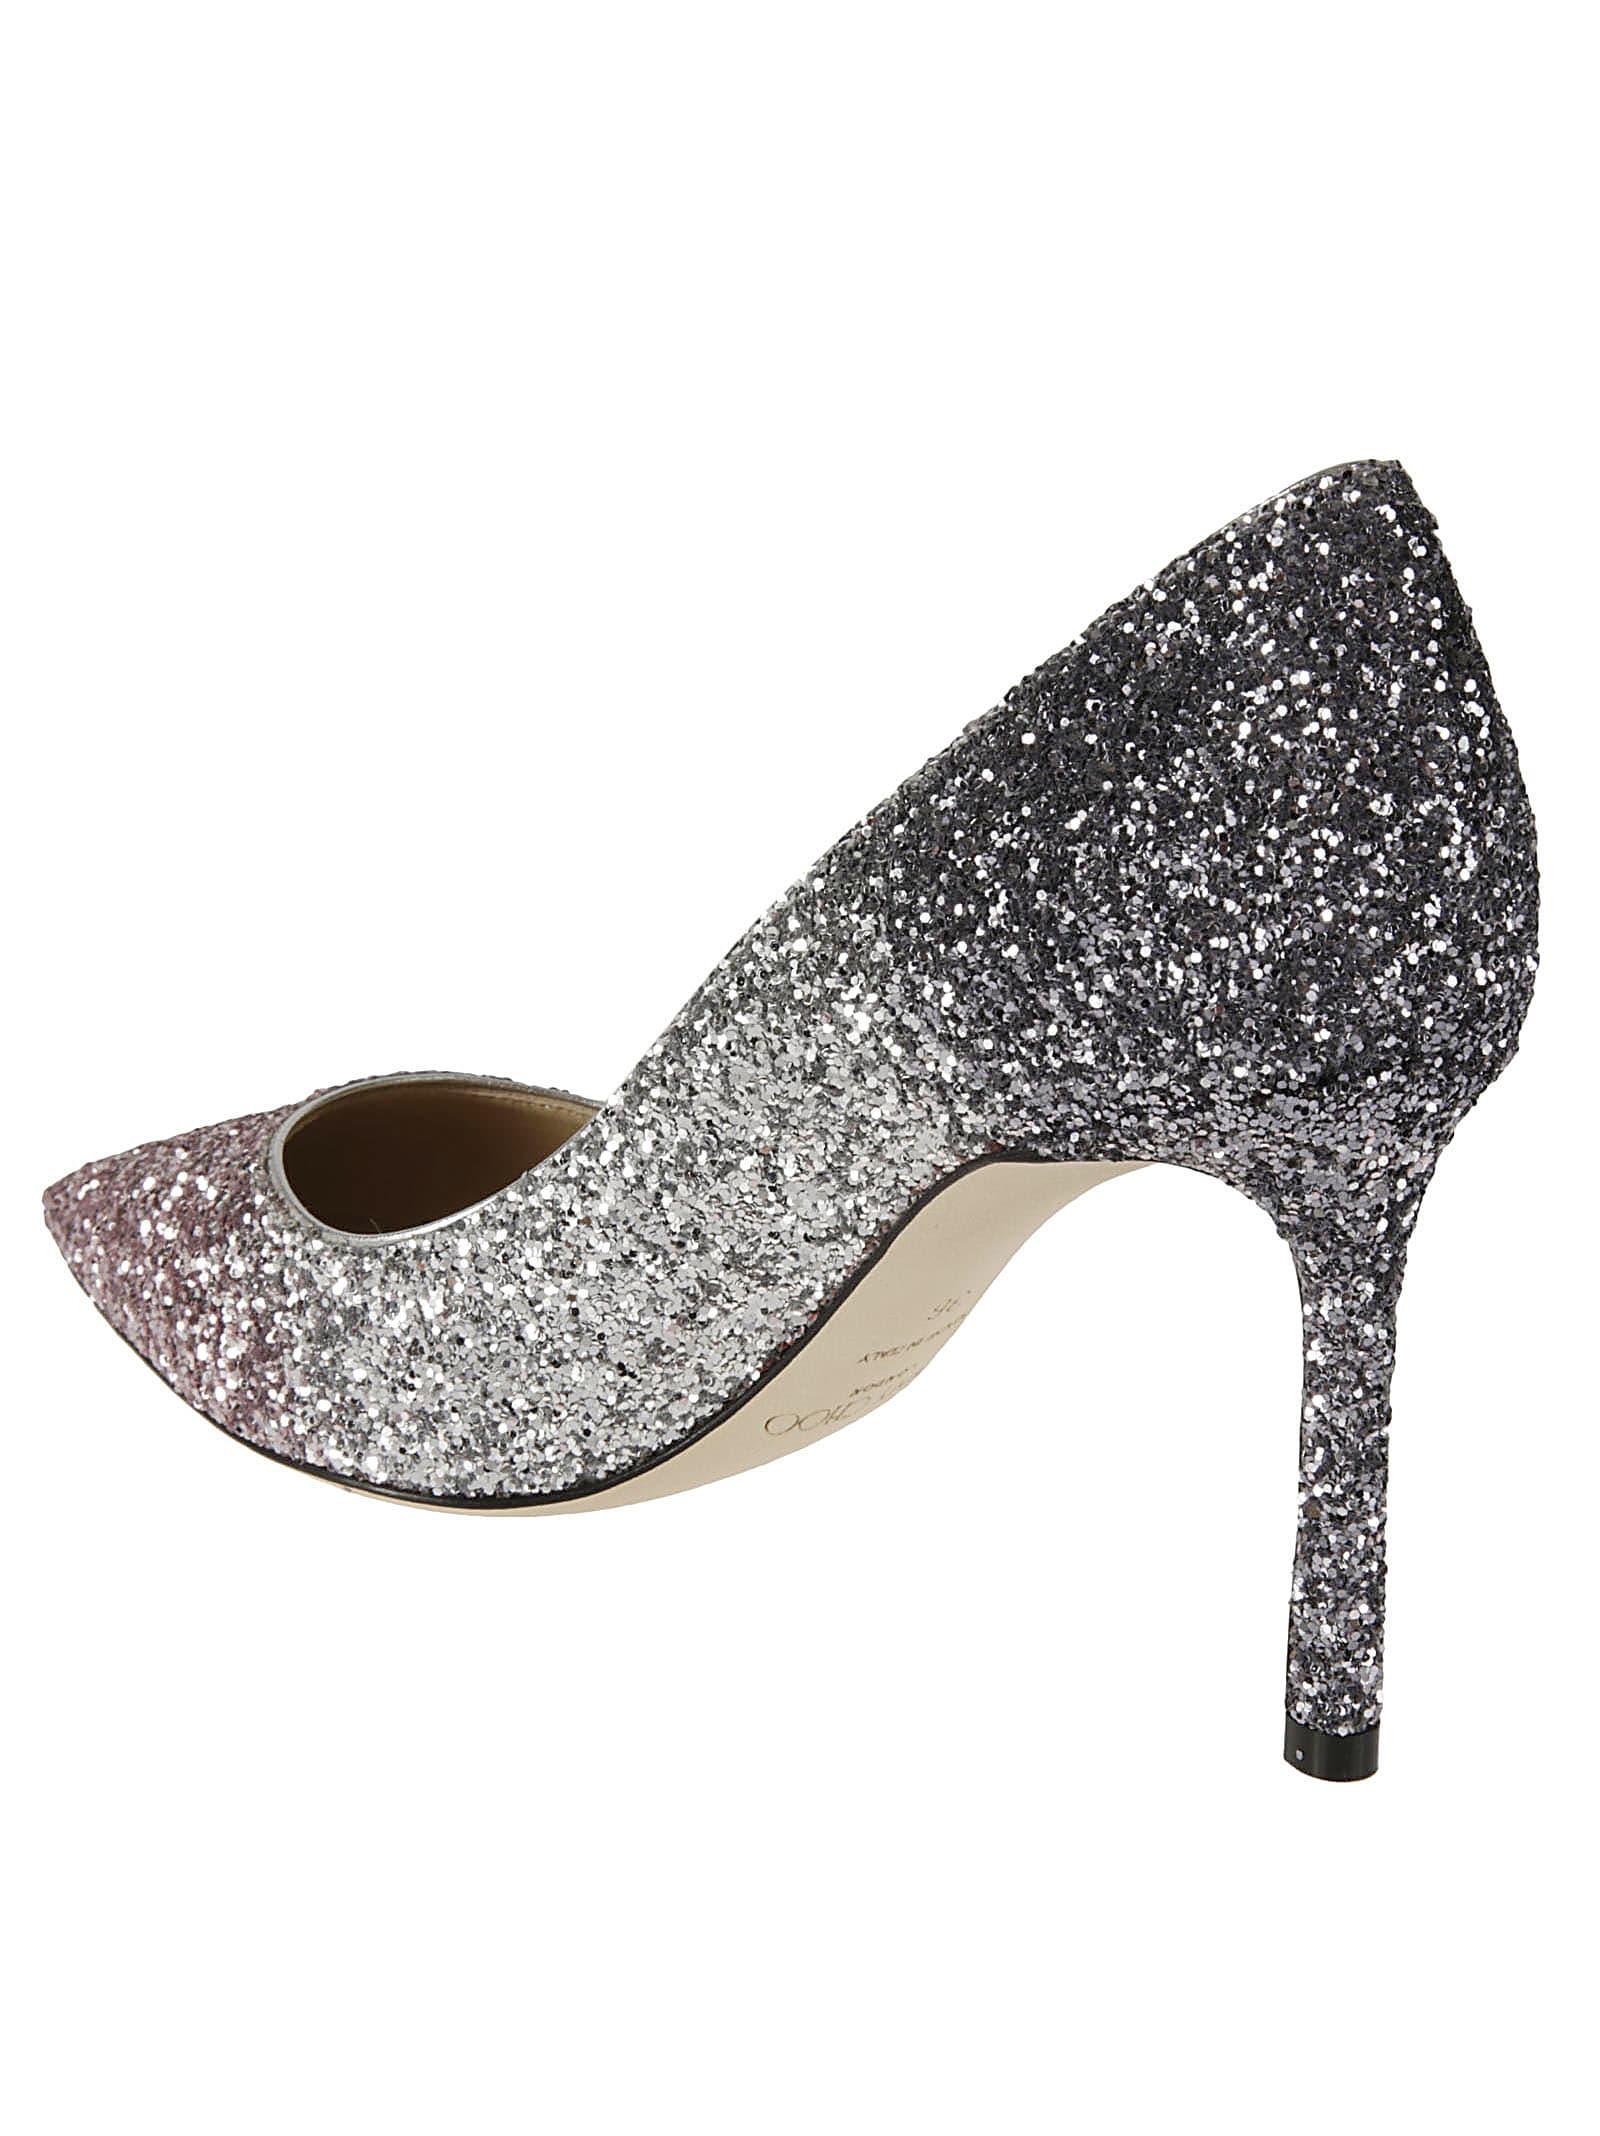 Jimmy Choo High-heeled shoes | italist